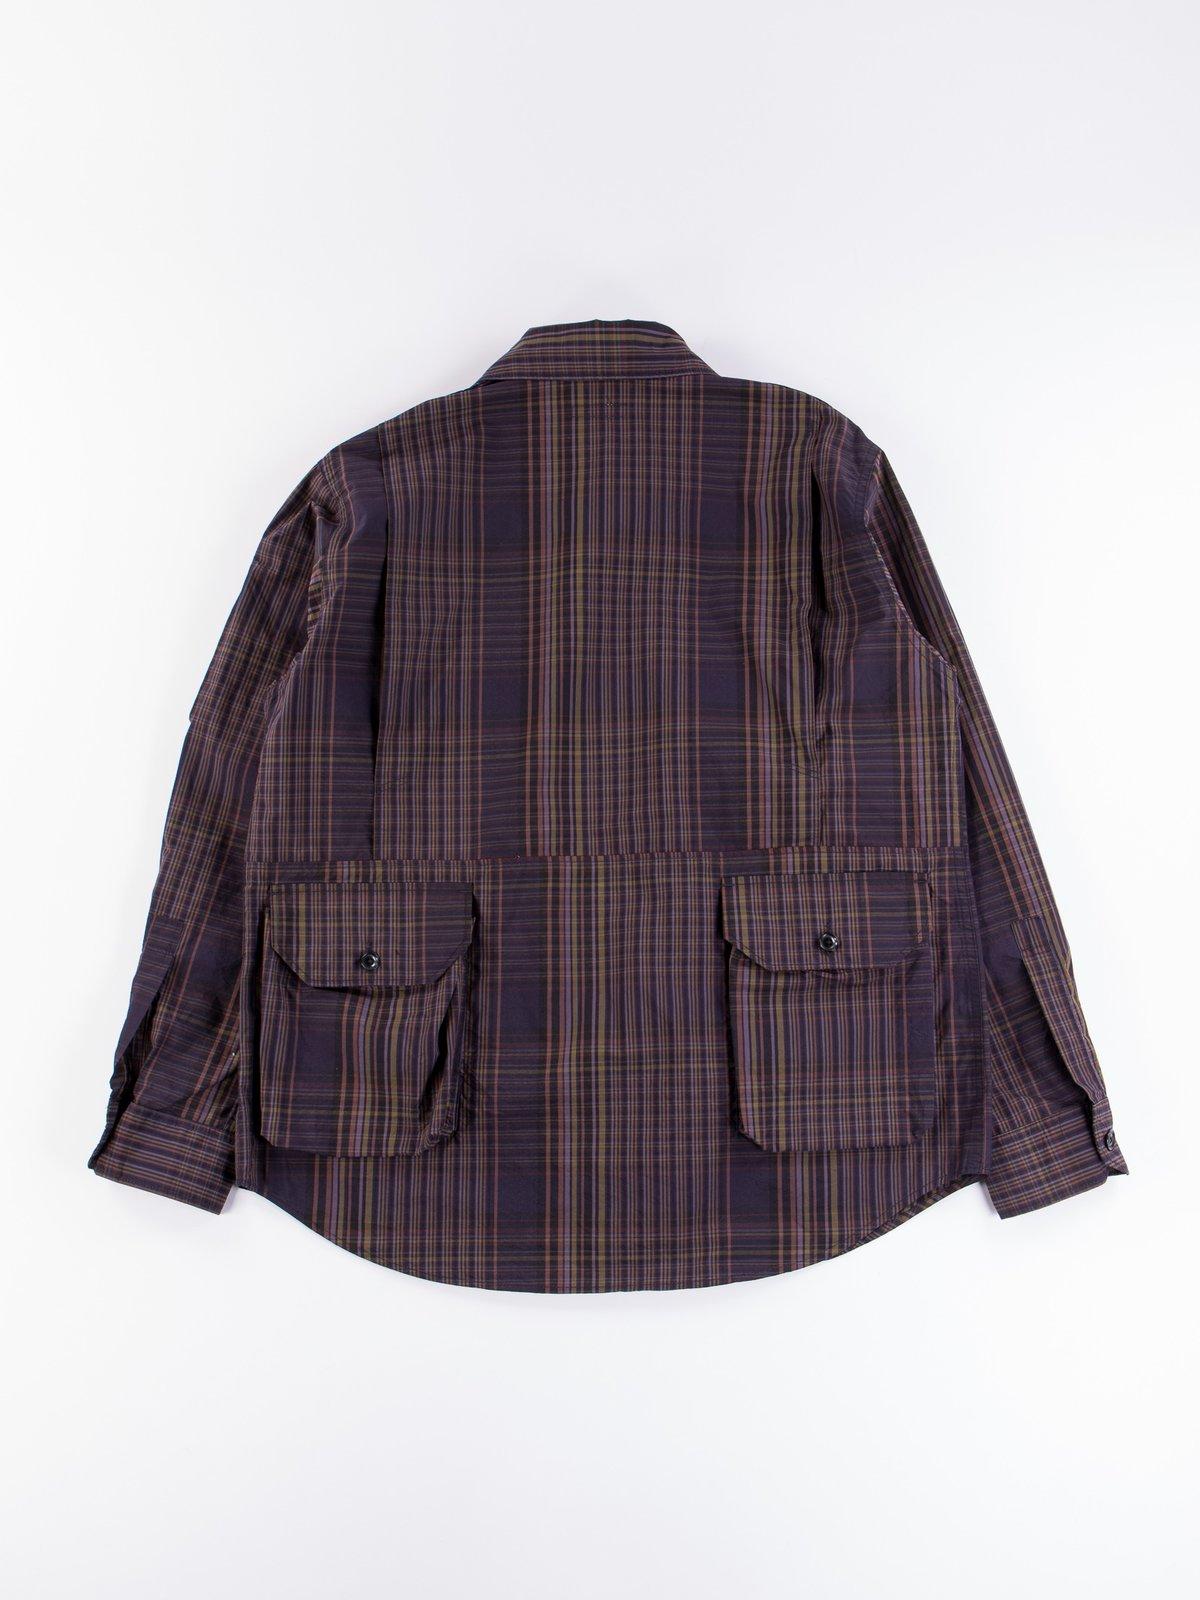 Multi Color Nyco Plaid Explorer Shirt Jacket - Image 6